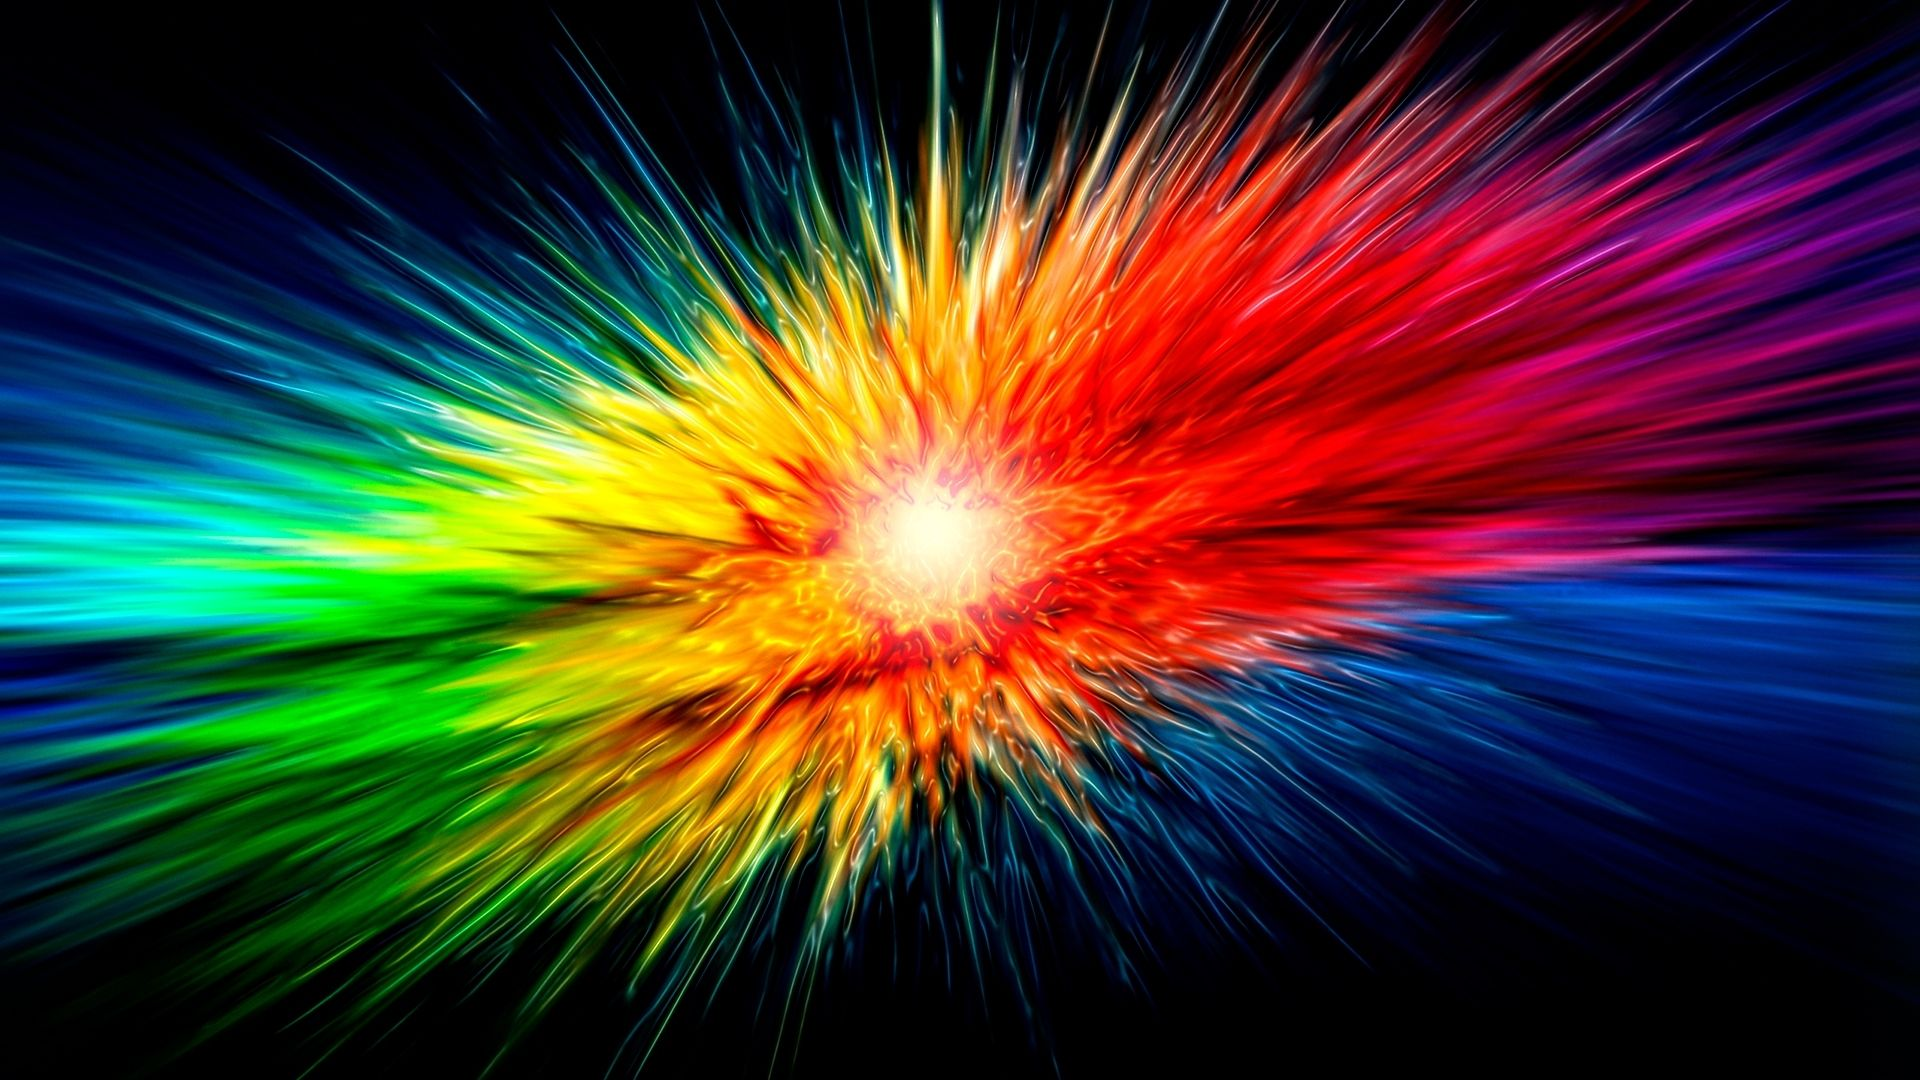 HD Wallpapers Widescreen 1080P 3D   ... Size   More color boom 1080p hd wallpaper 1920x…   Cool ...